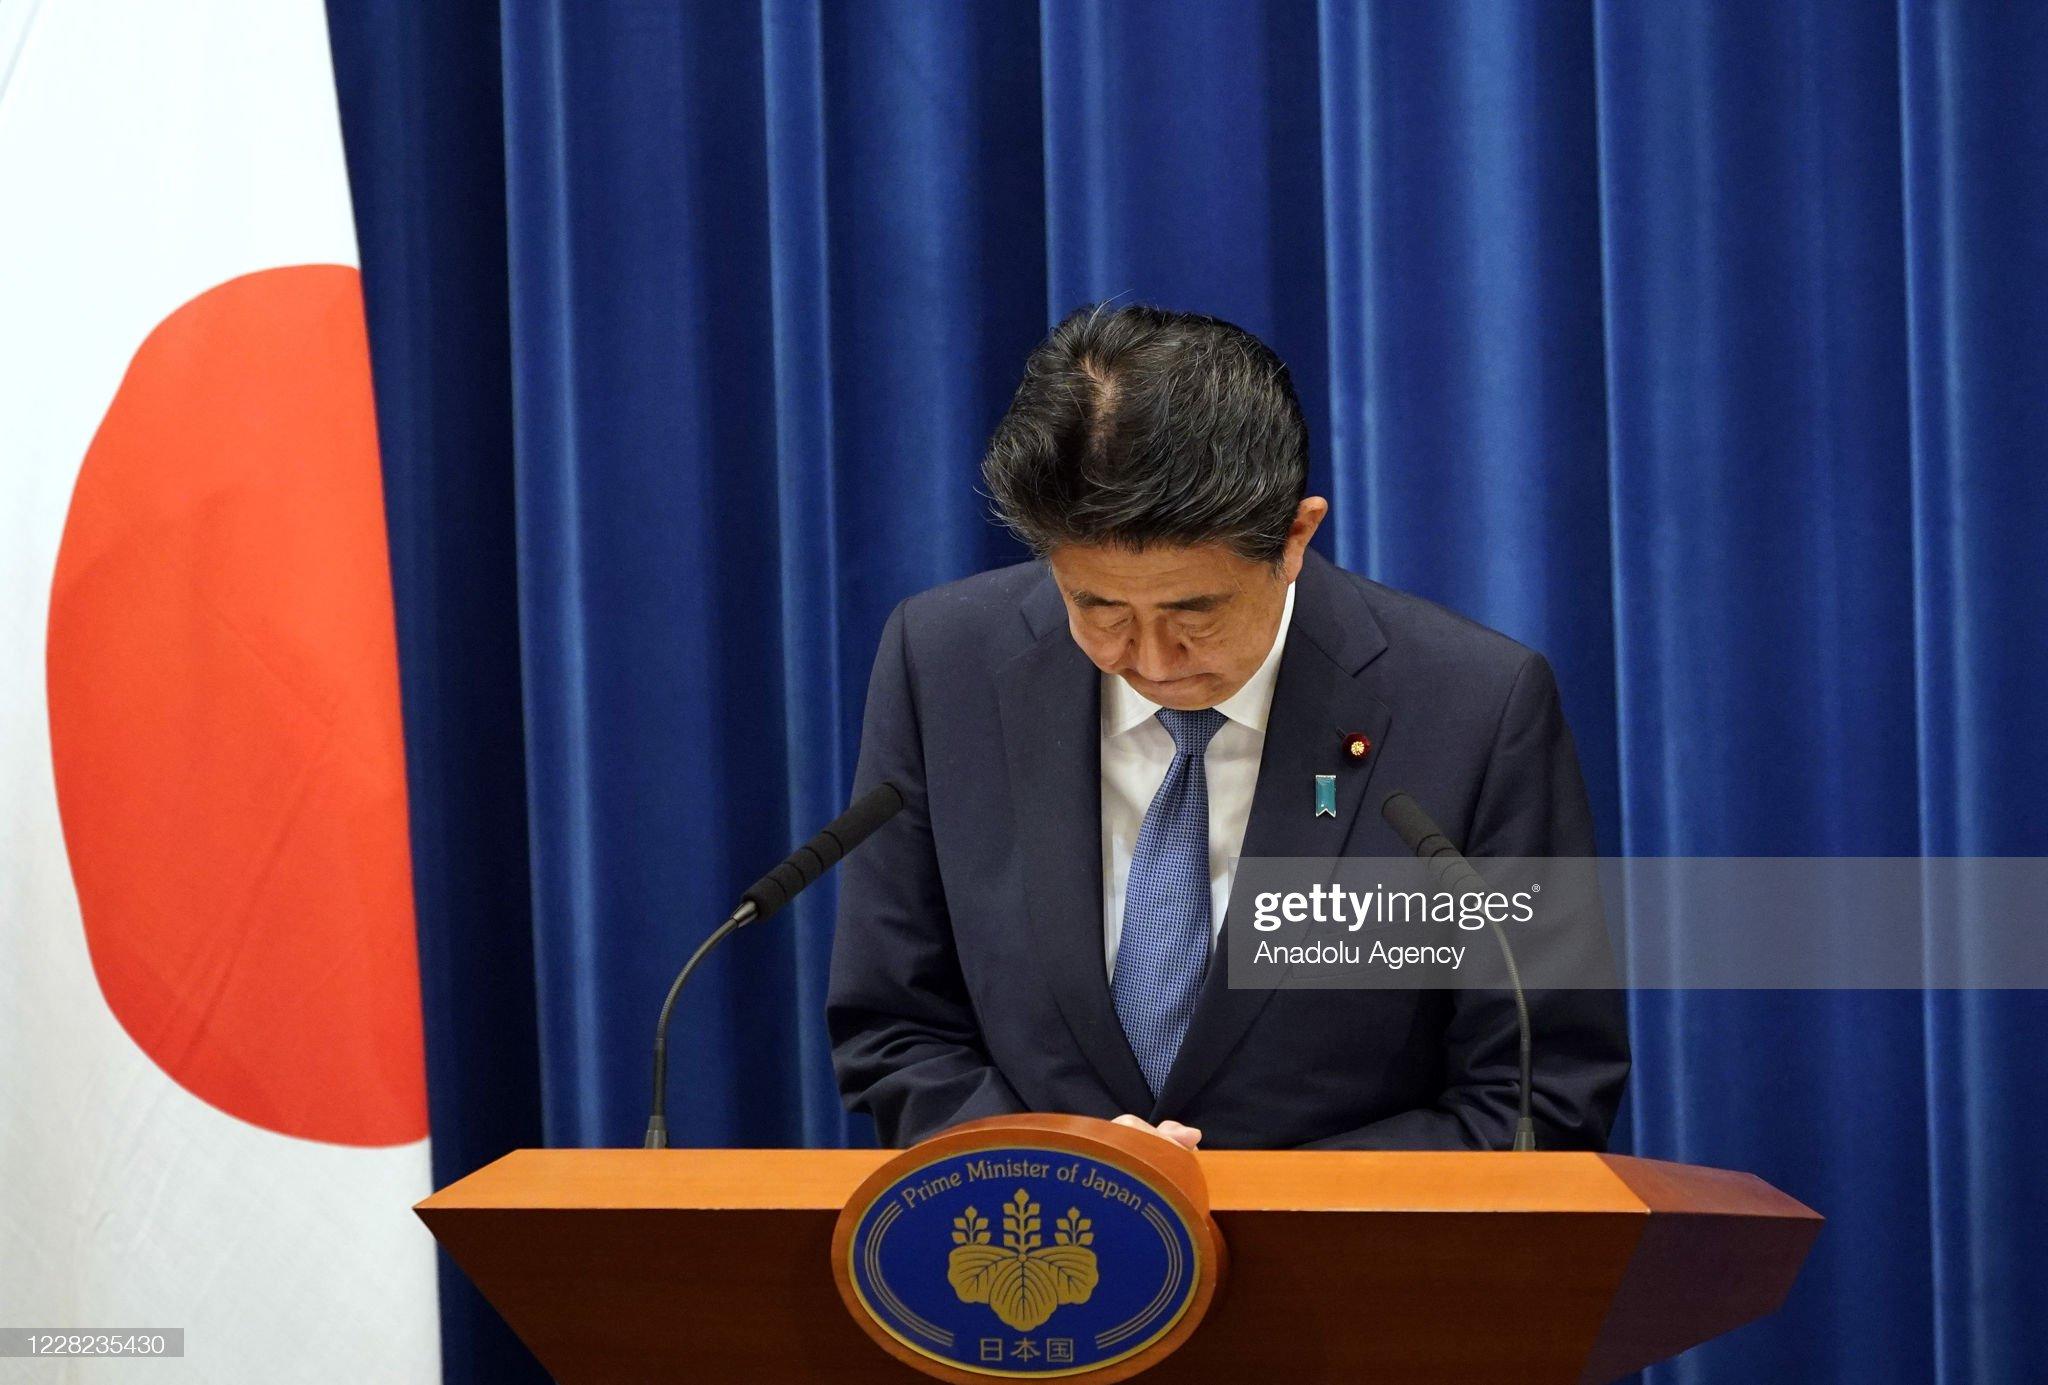 Japan's Prime Minister Abe Announces Resignation : News Photo